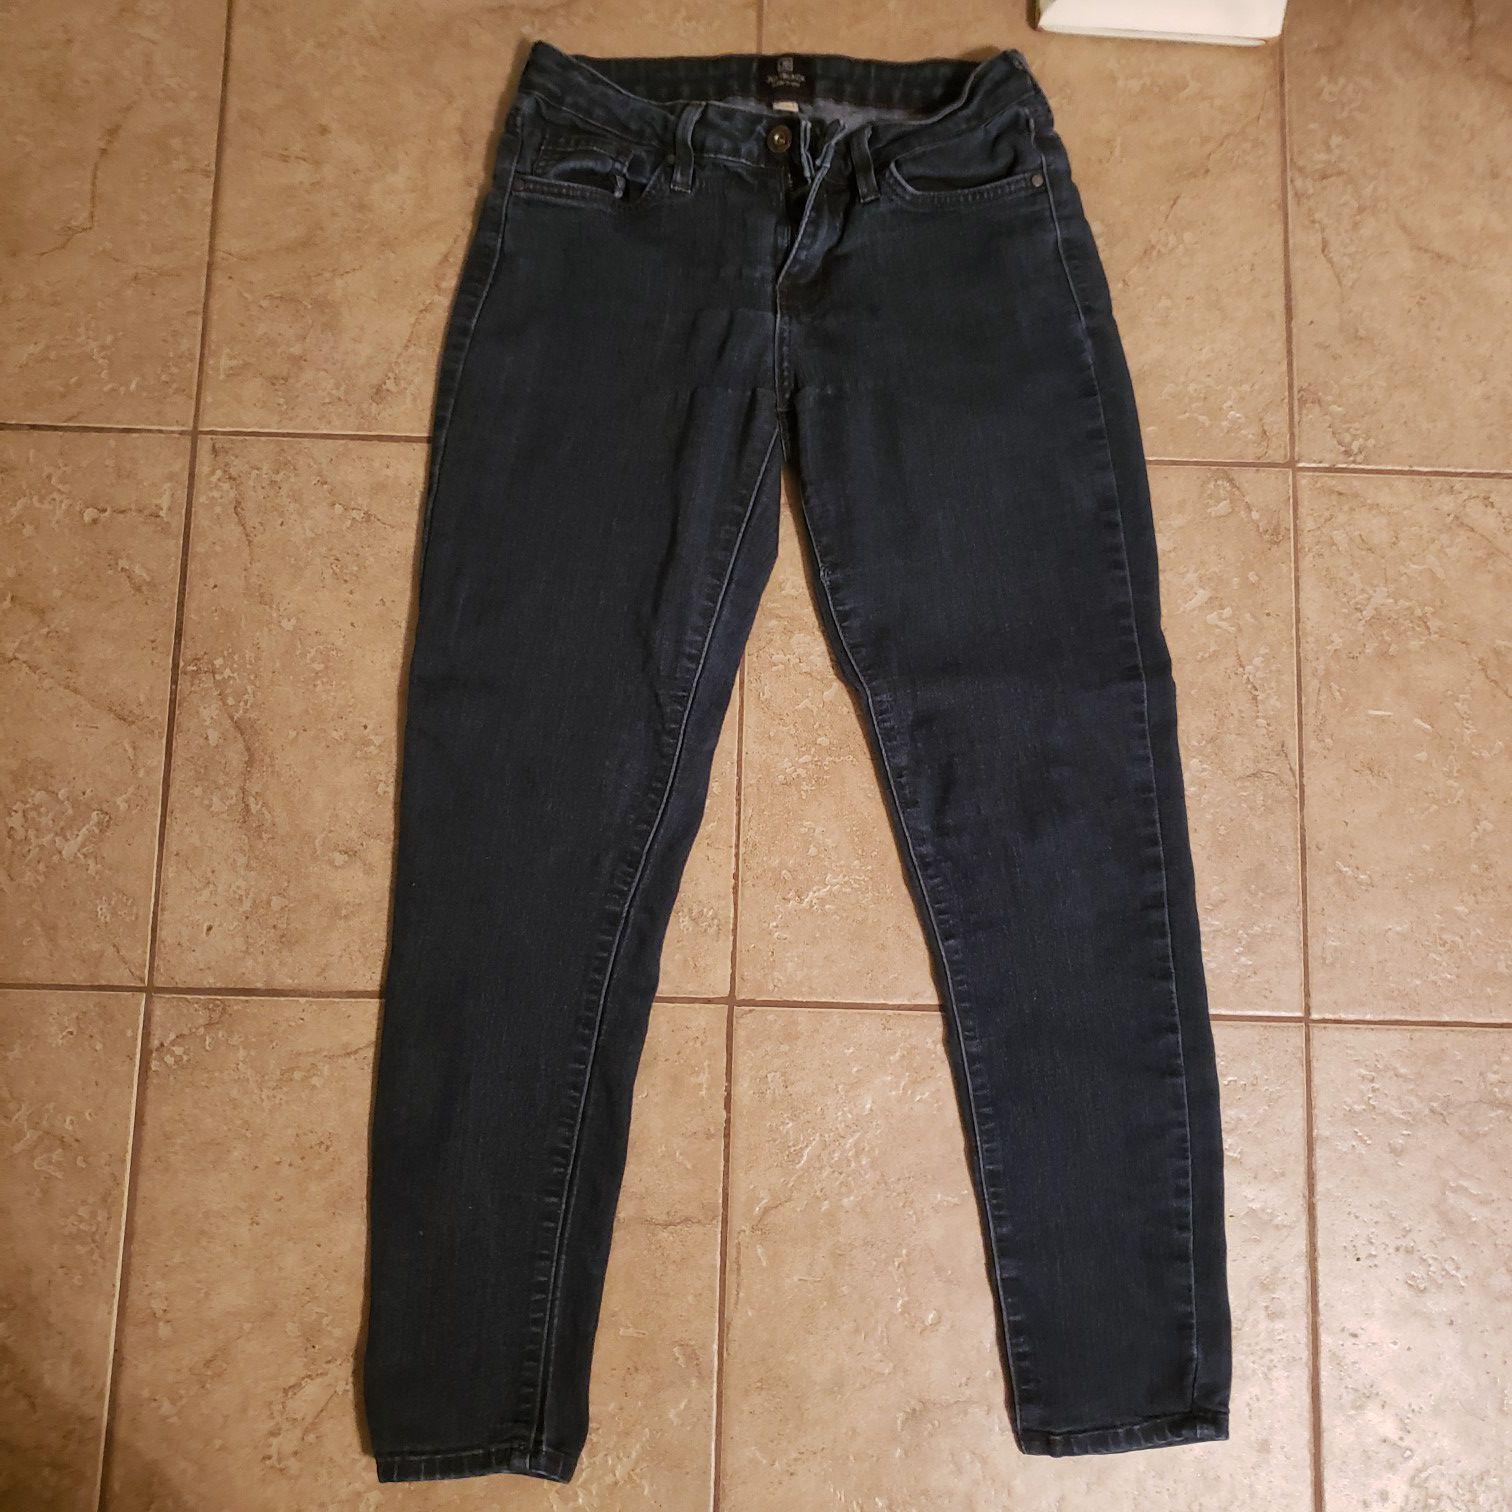 Size 26 (2) Just Black jeans